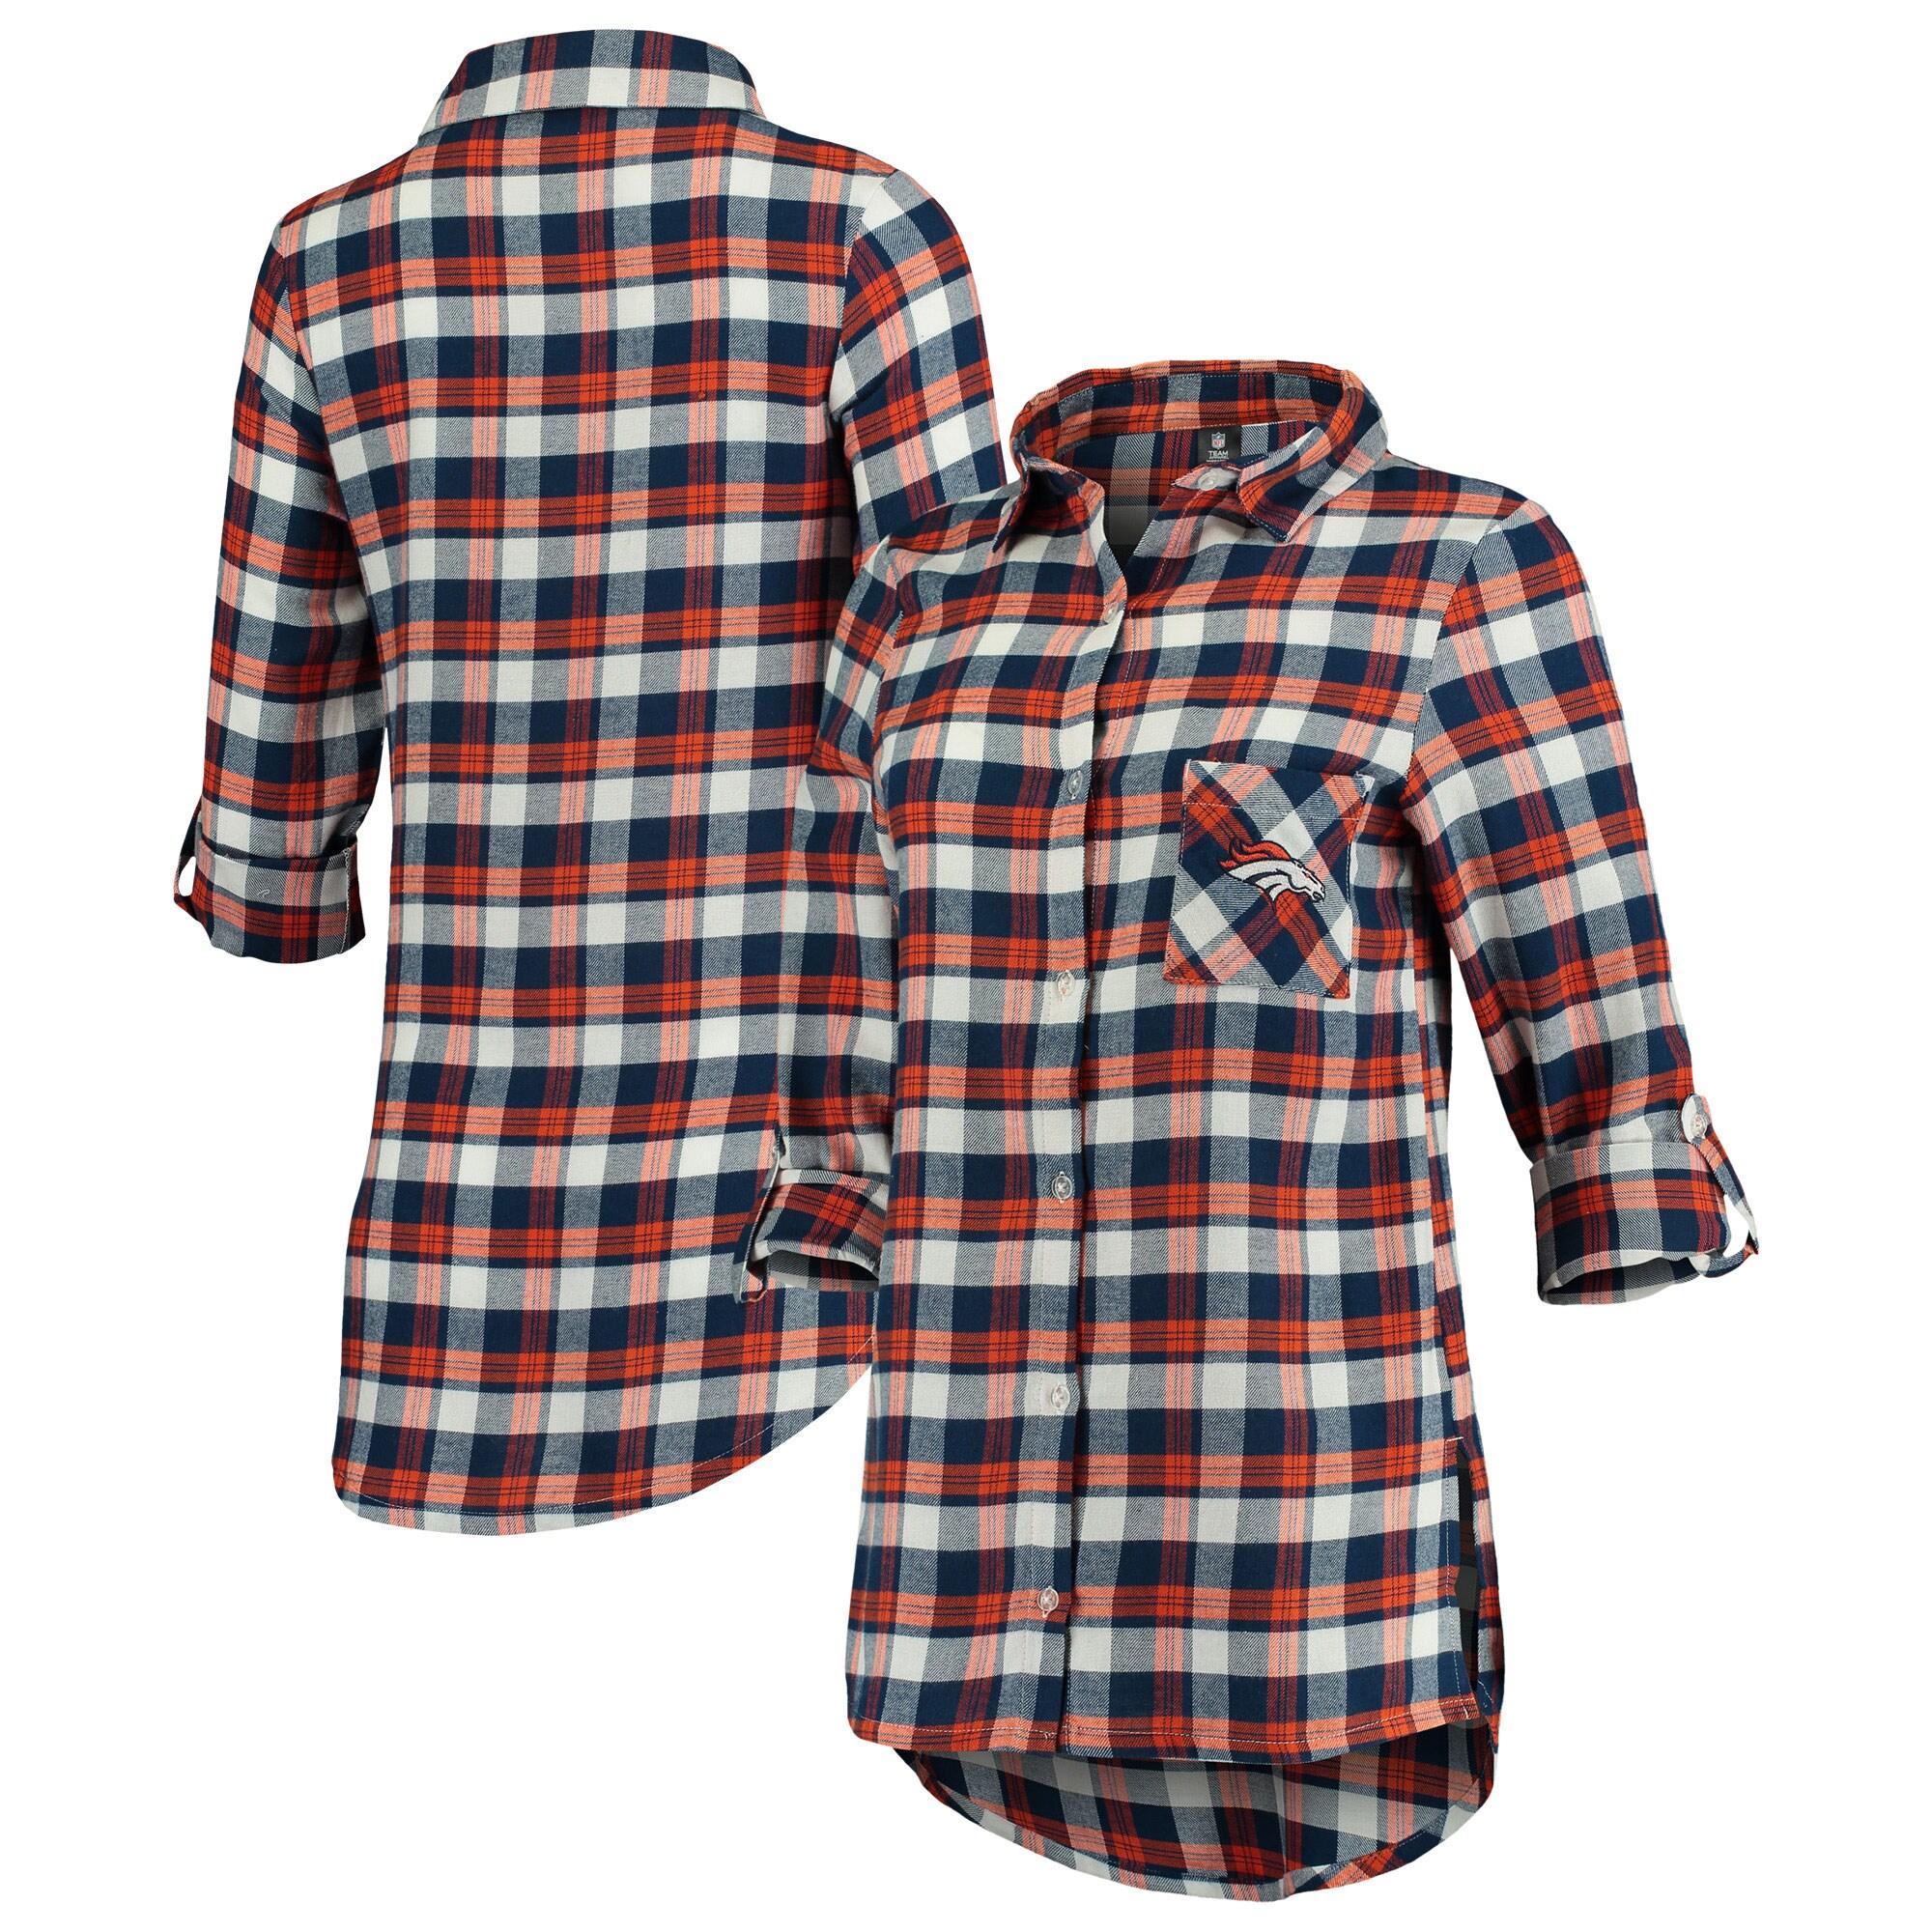 Denver Broncos Concepts Sport Women's Piedmont Flannel Button-Up Long Sleeve Shirt - Navy/Orange